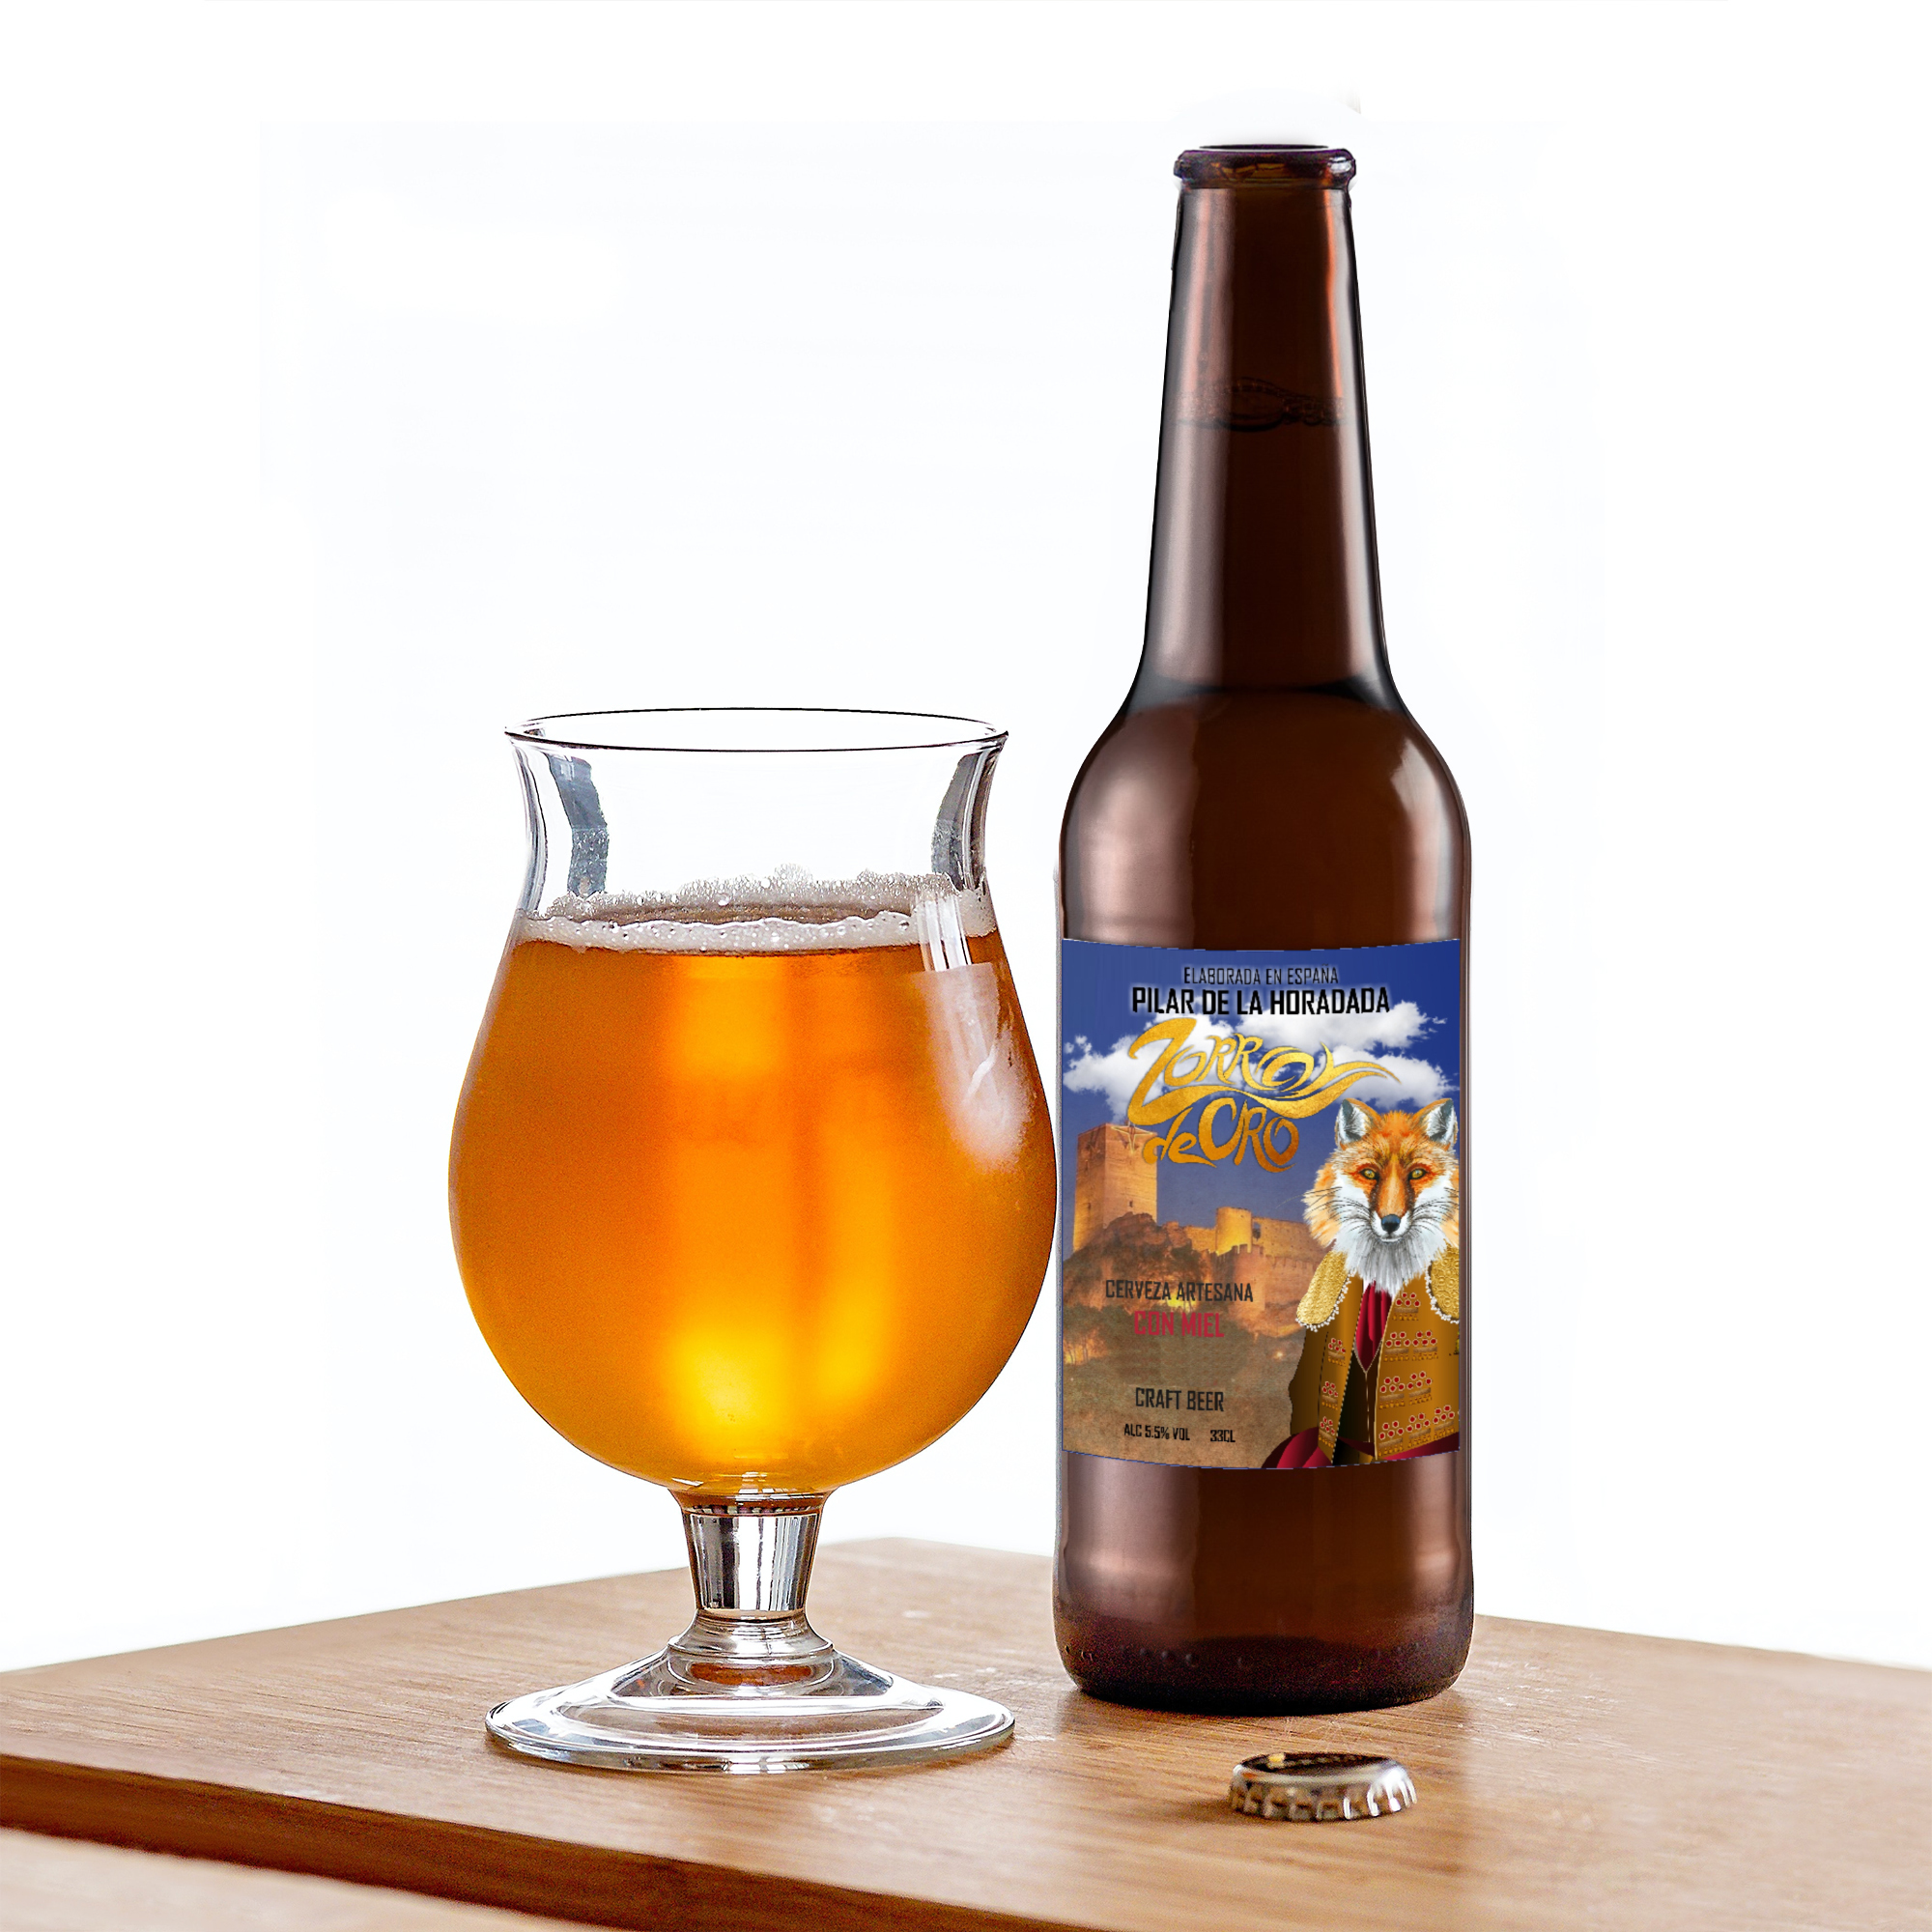 Cerveza de miel, 5.5%